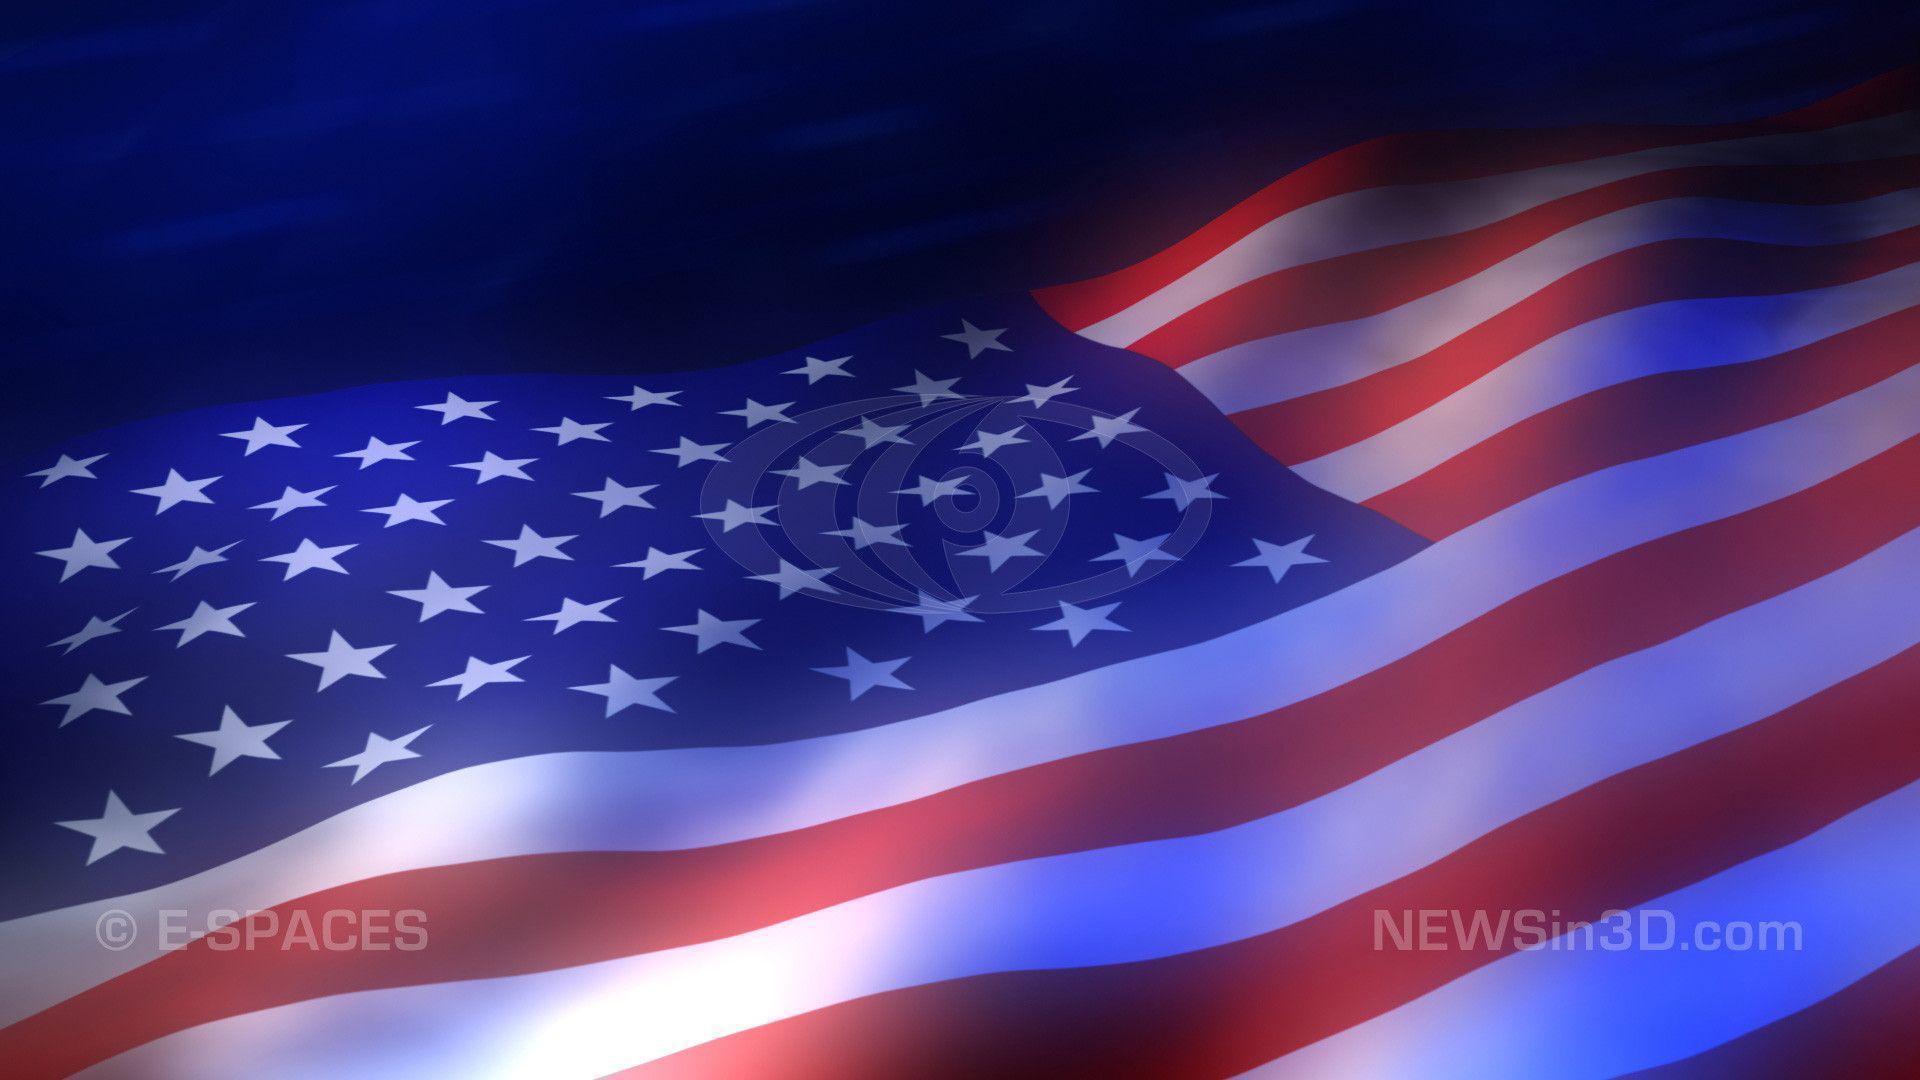 United States Flag Backgrounds 1920x1080